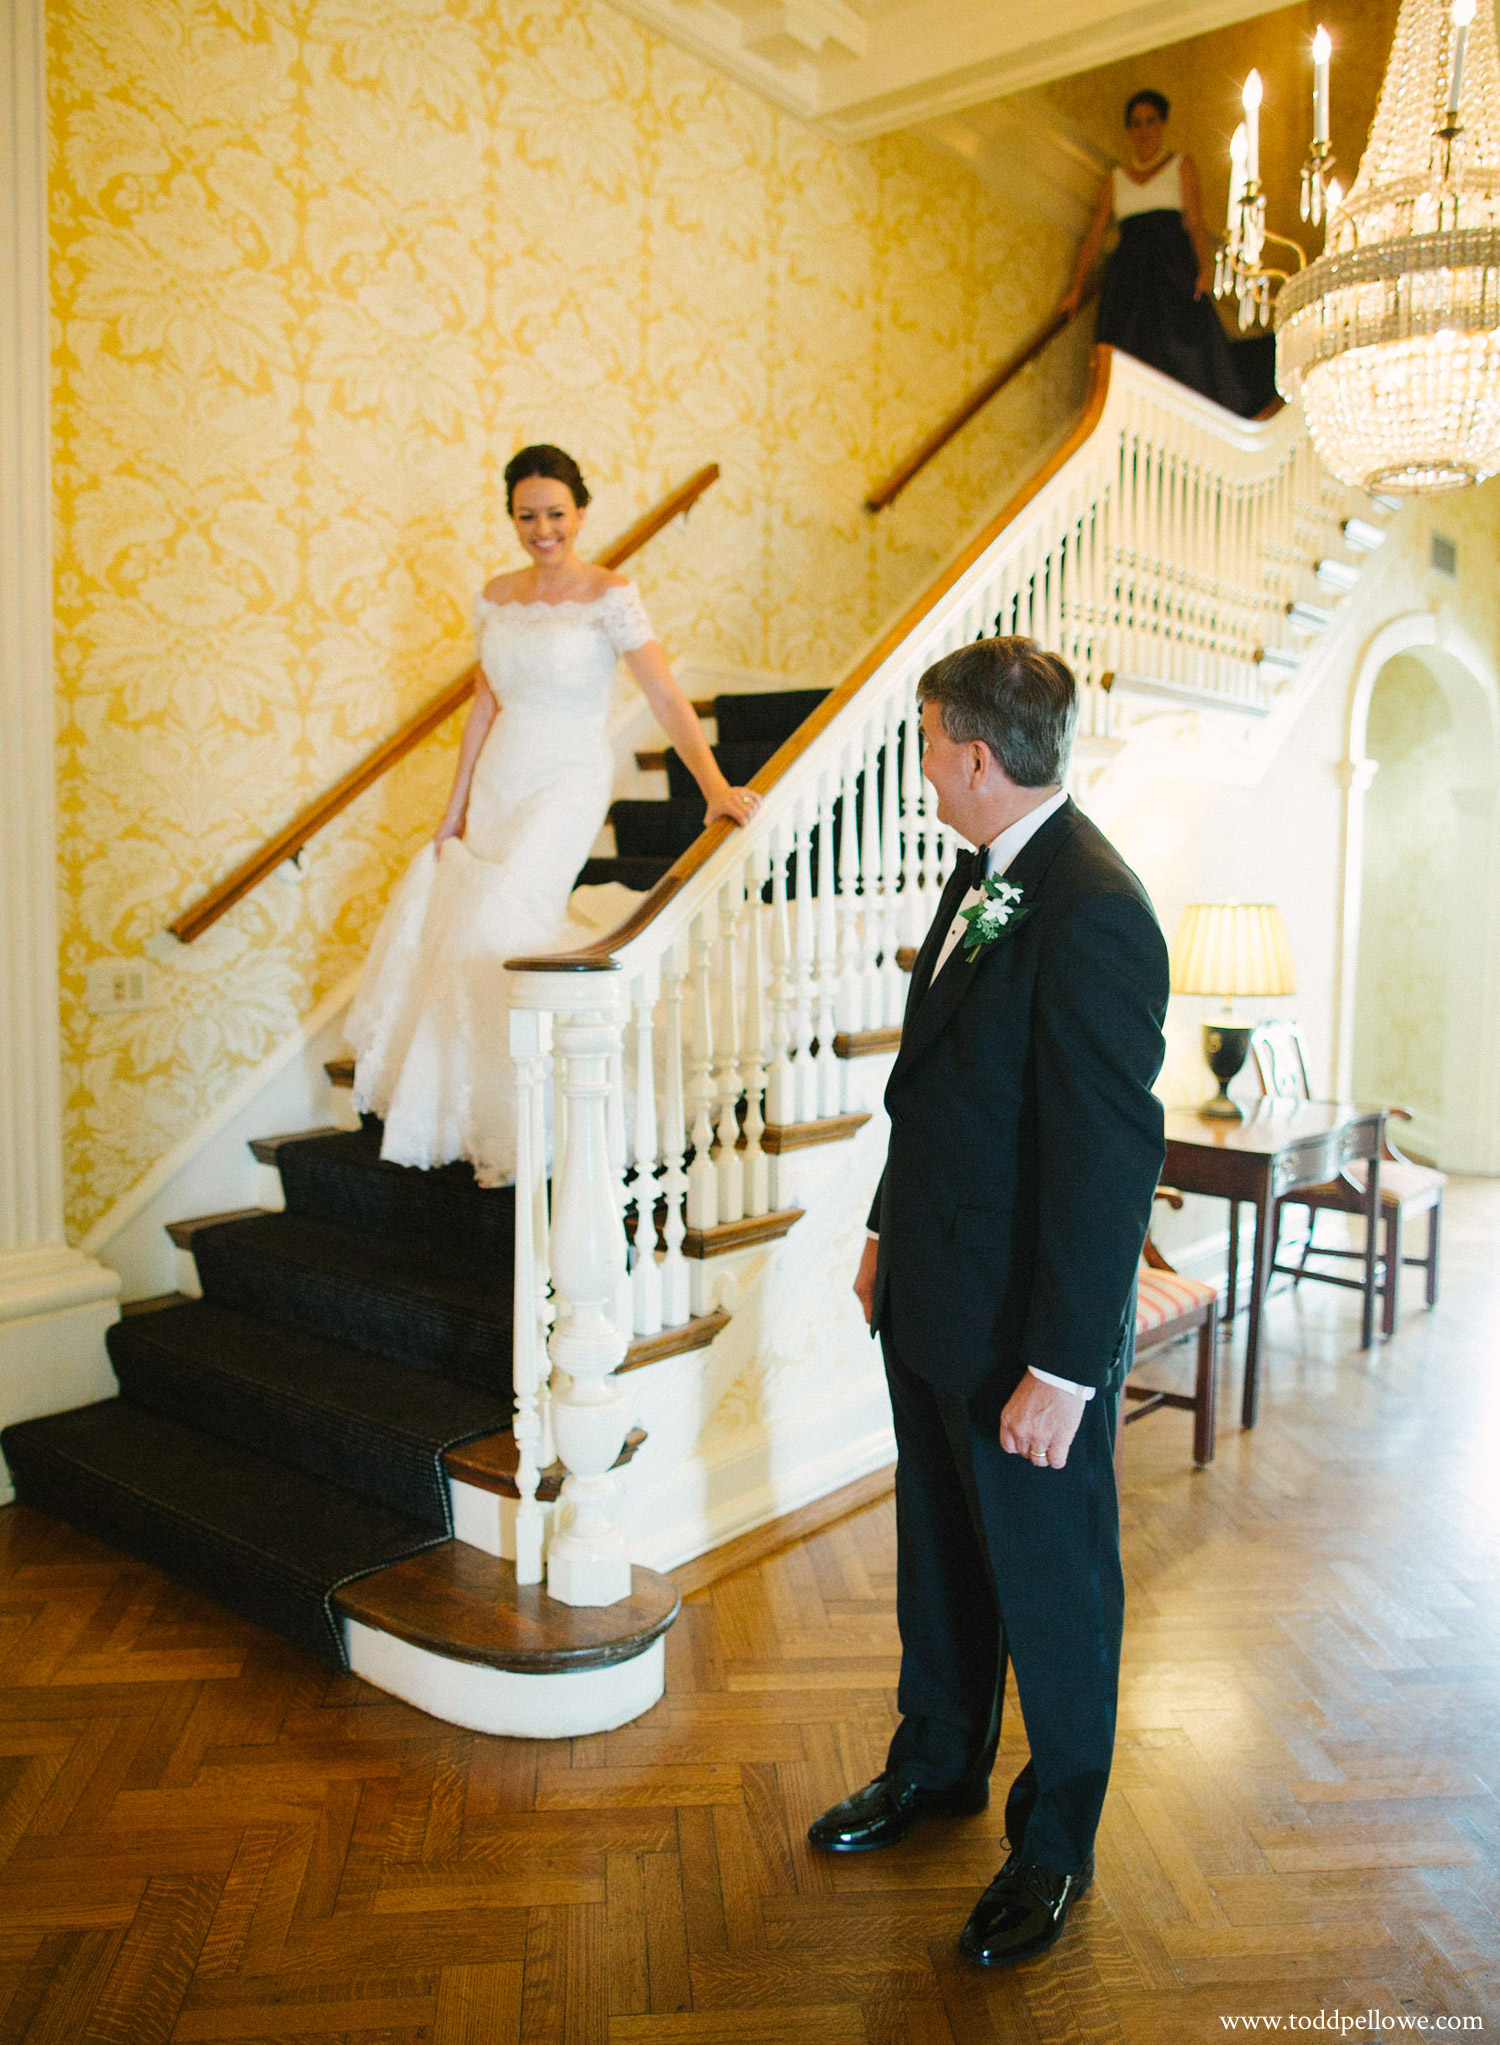 30-louisville-country-club-wedding-038.jpg